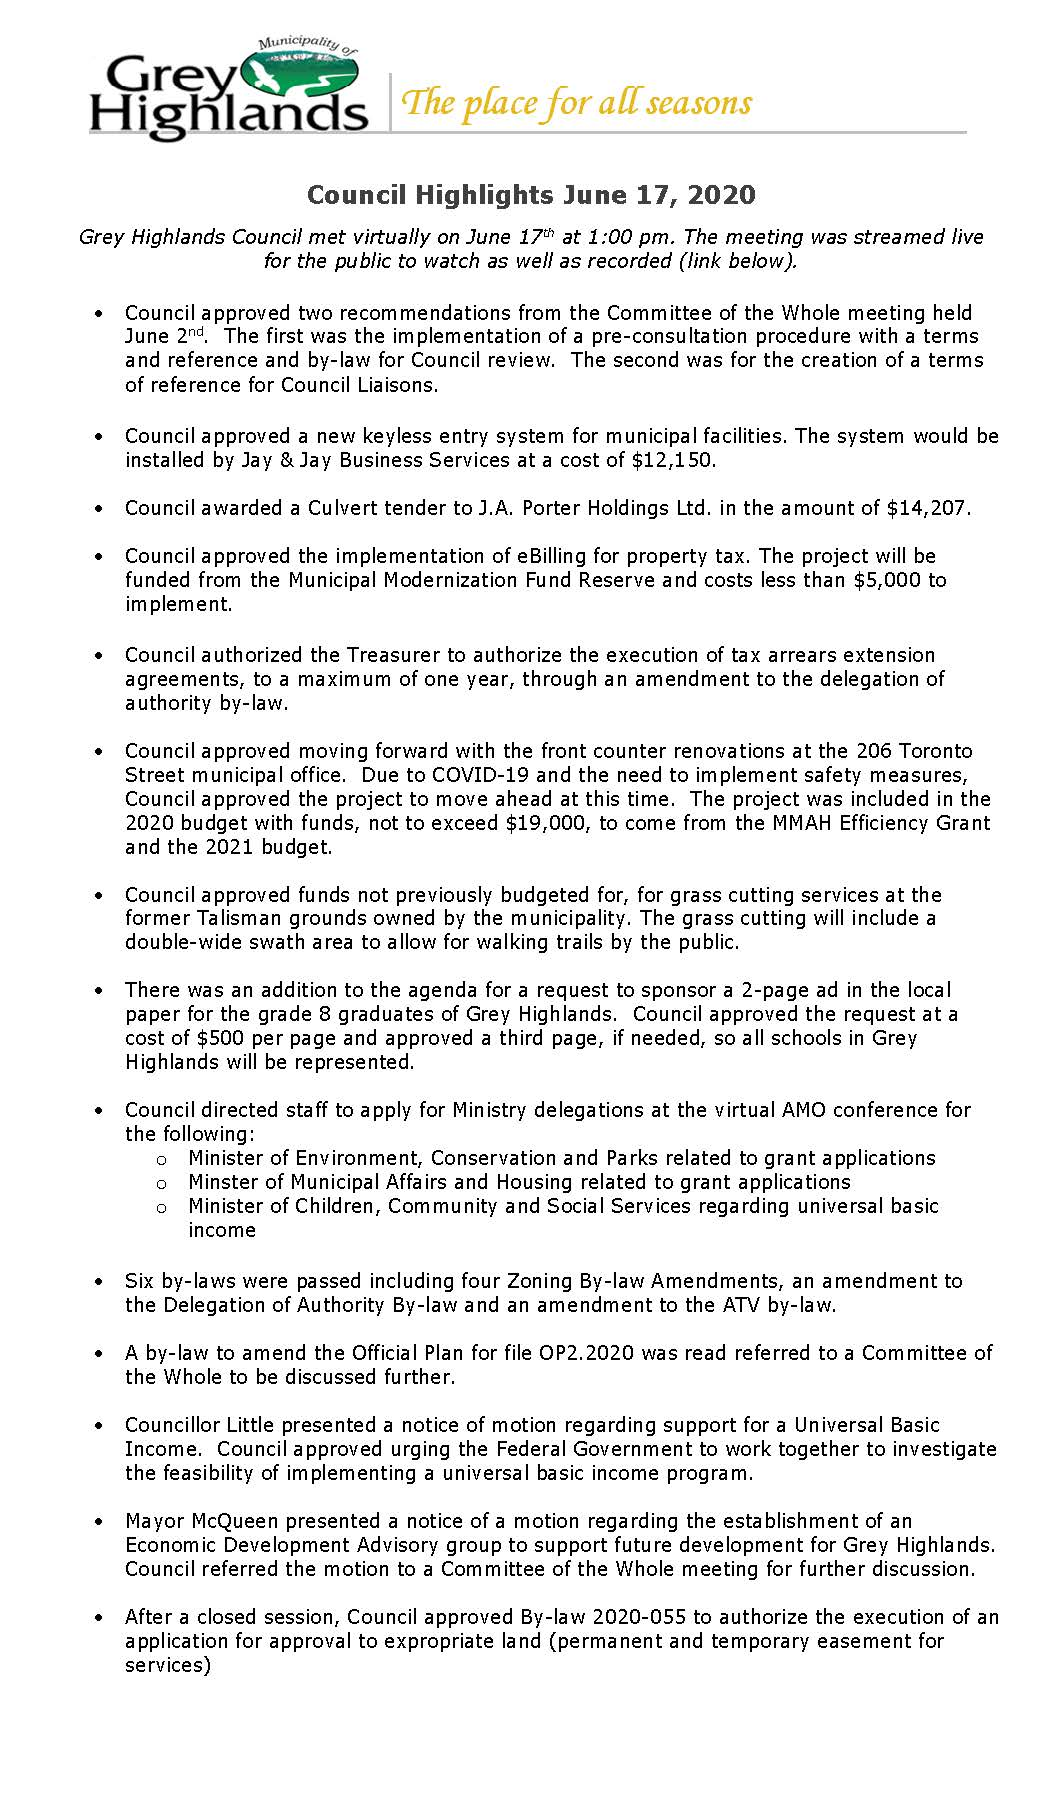 Council Highlights June 17, 2020